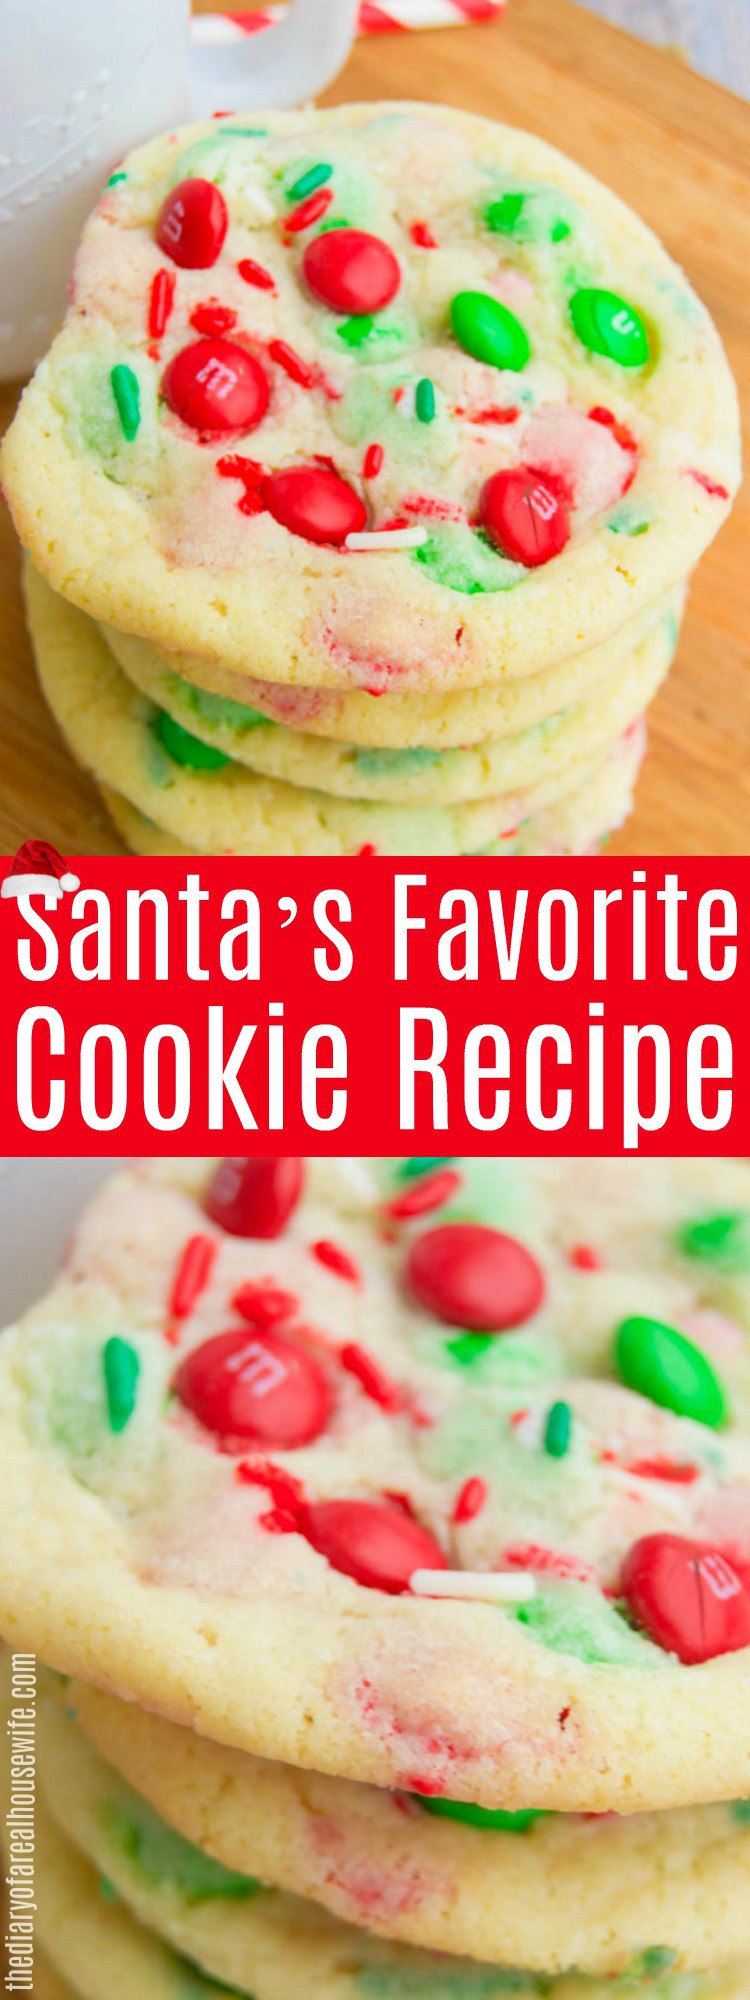 Santas Favorite Cookie Recipe